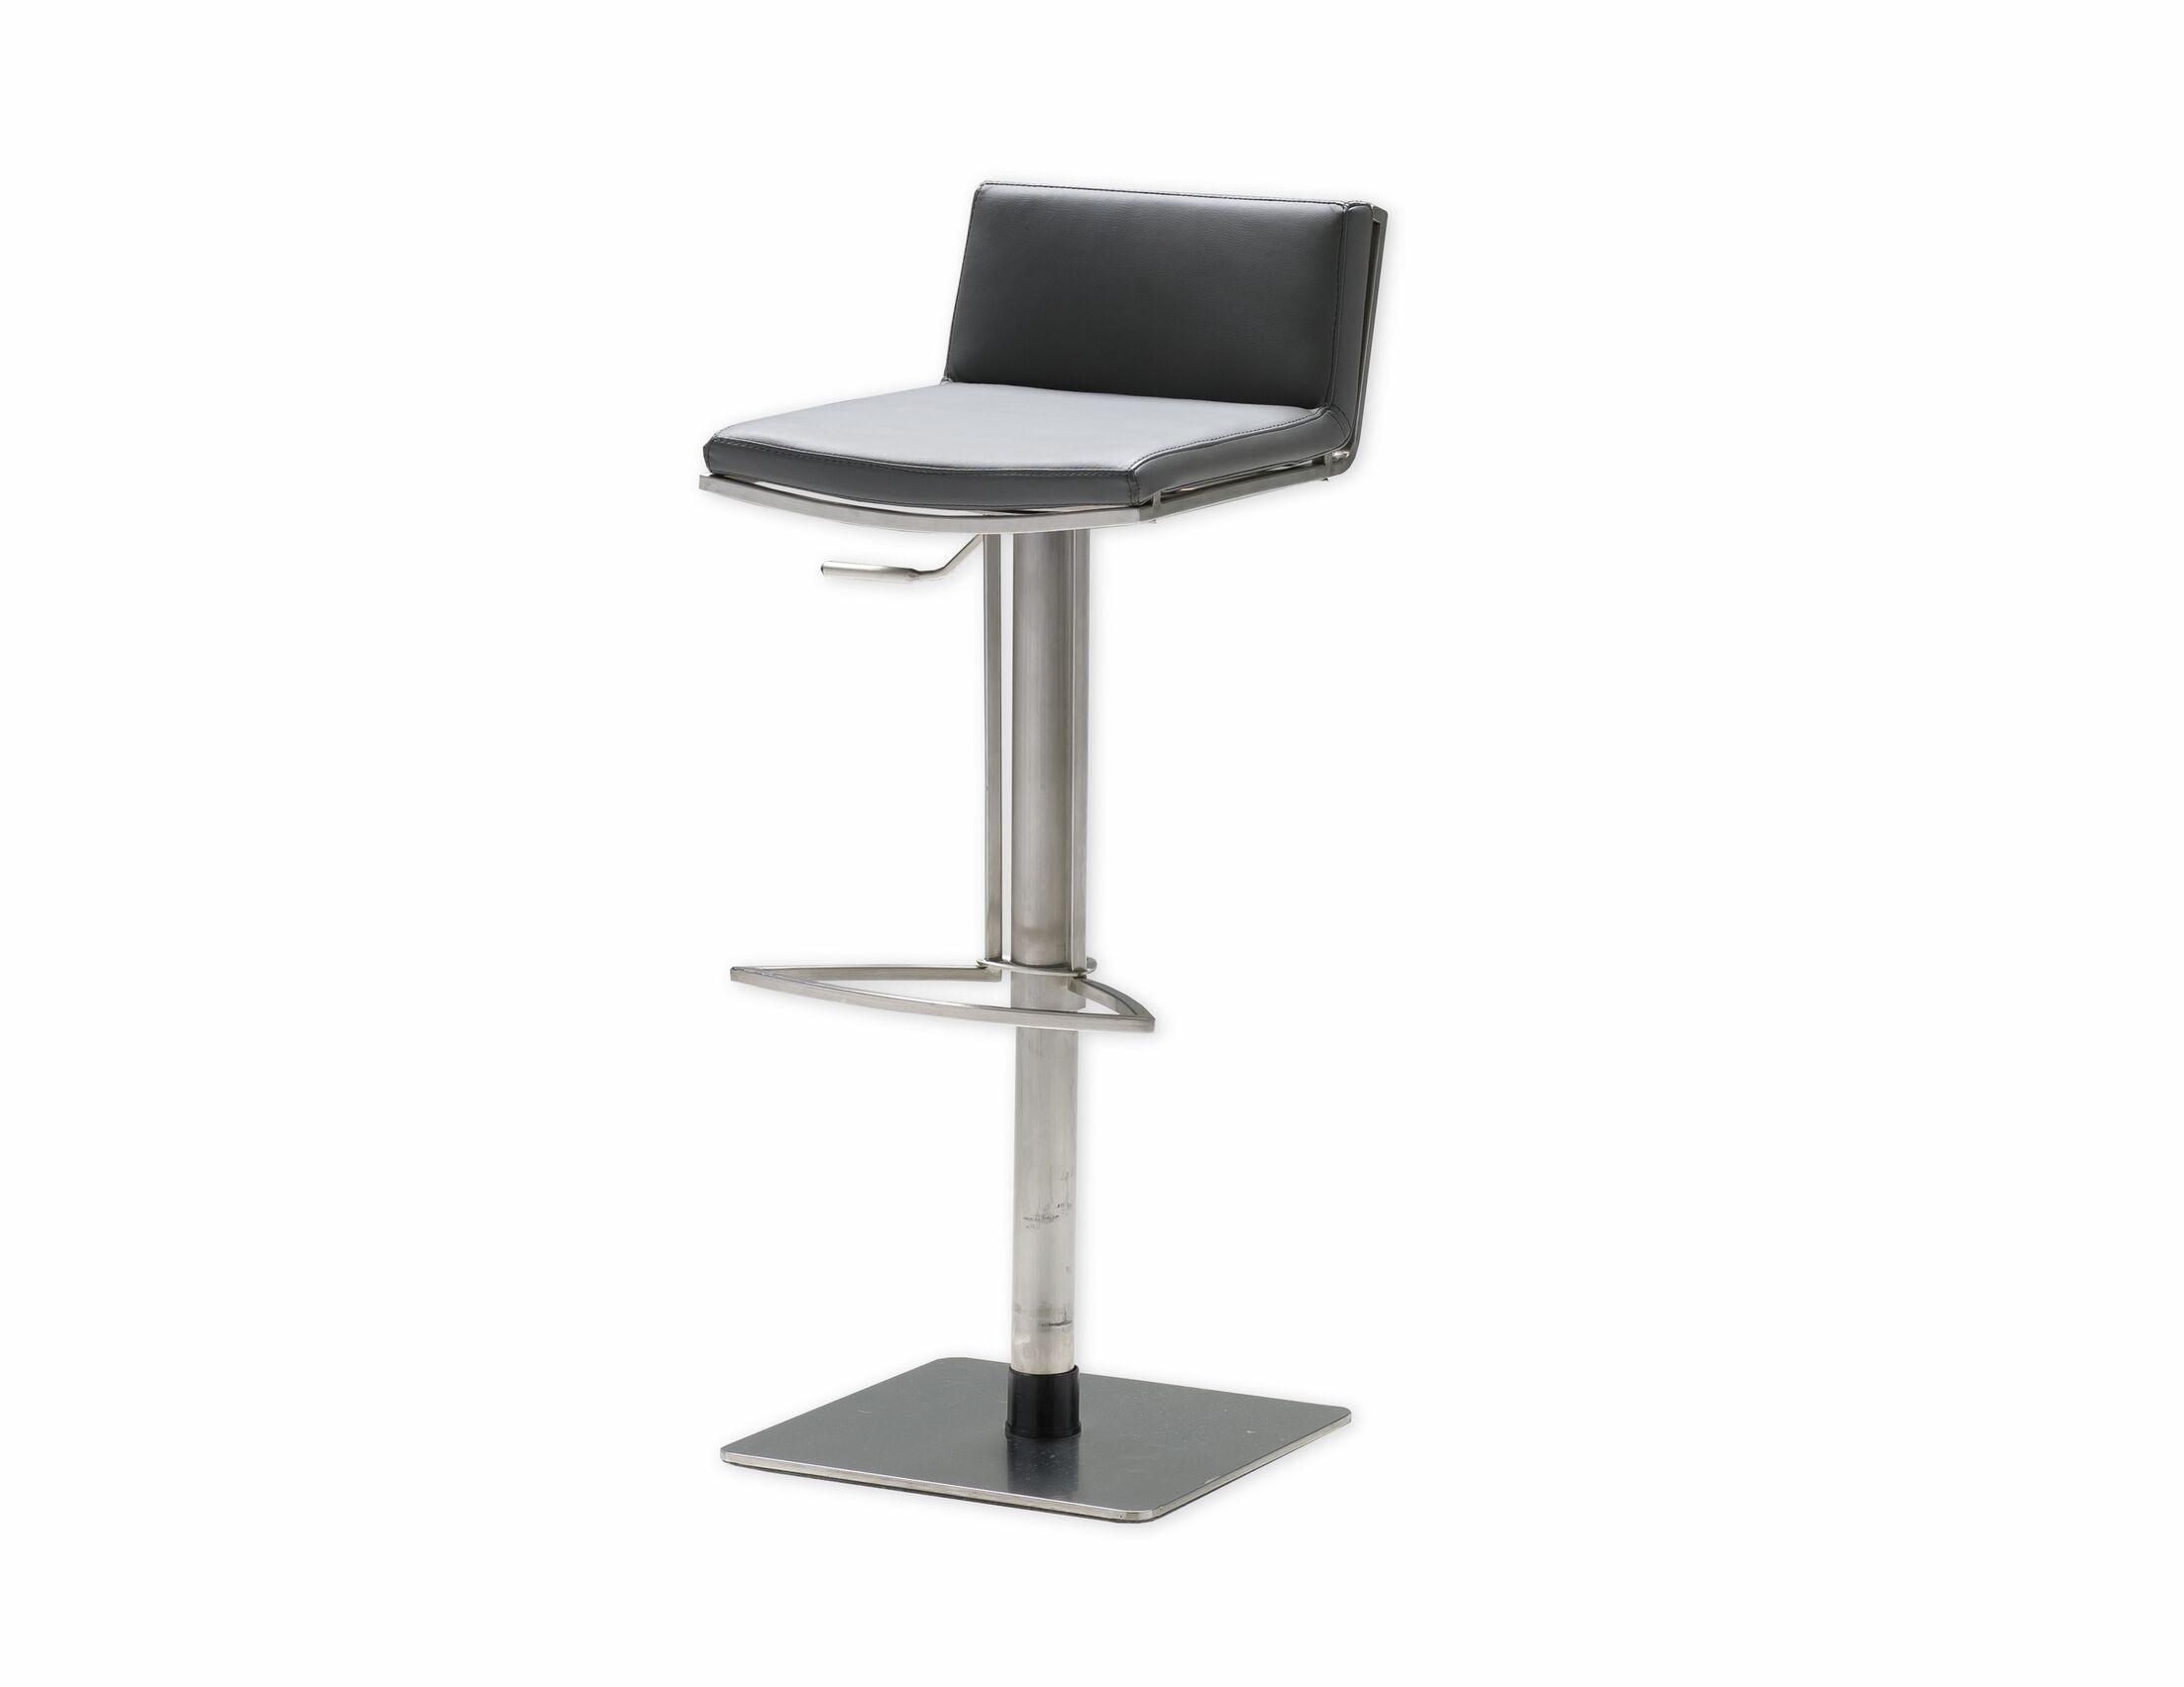 Bond Adjustable Height Swivel Bar Stool Seat: Grey